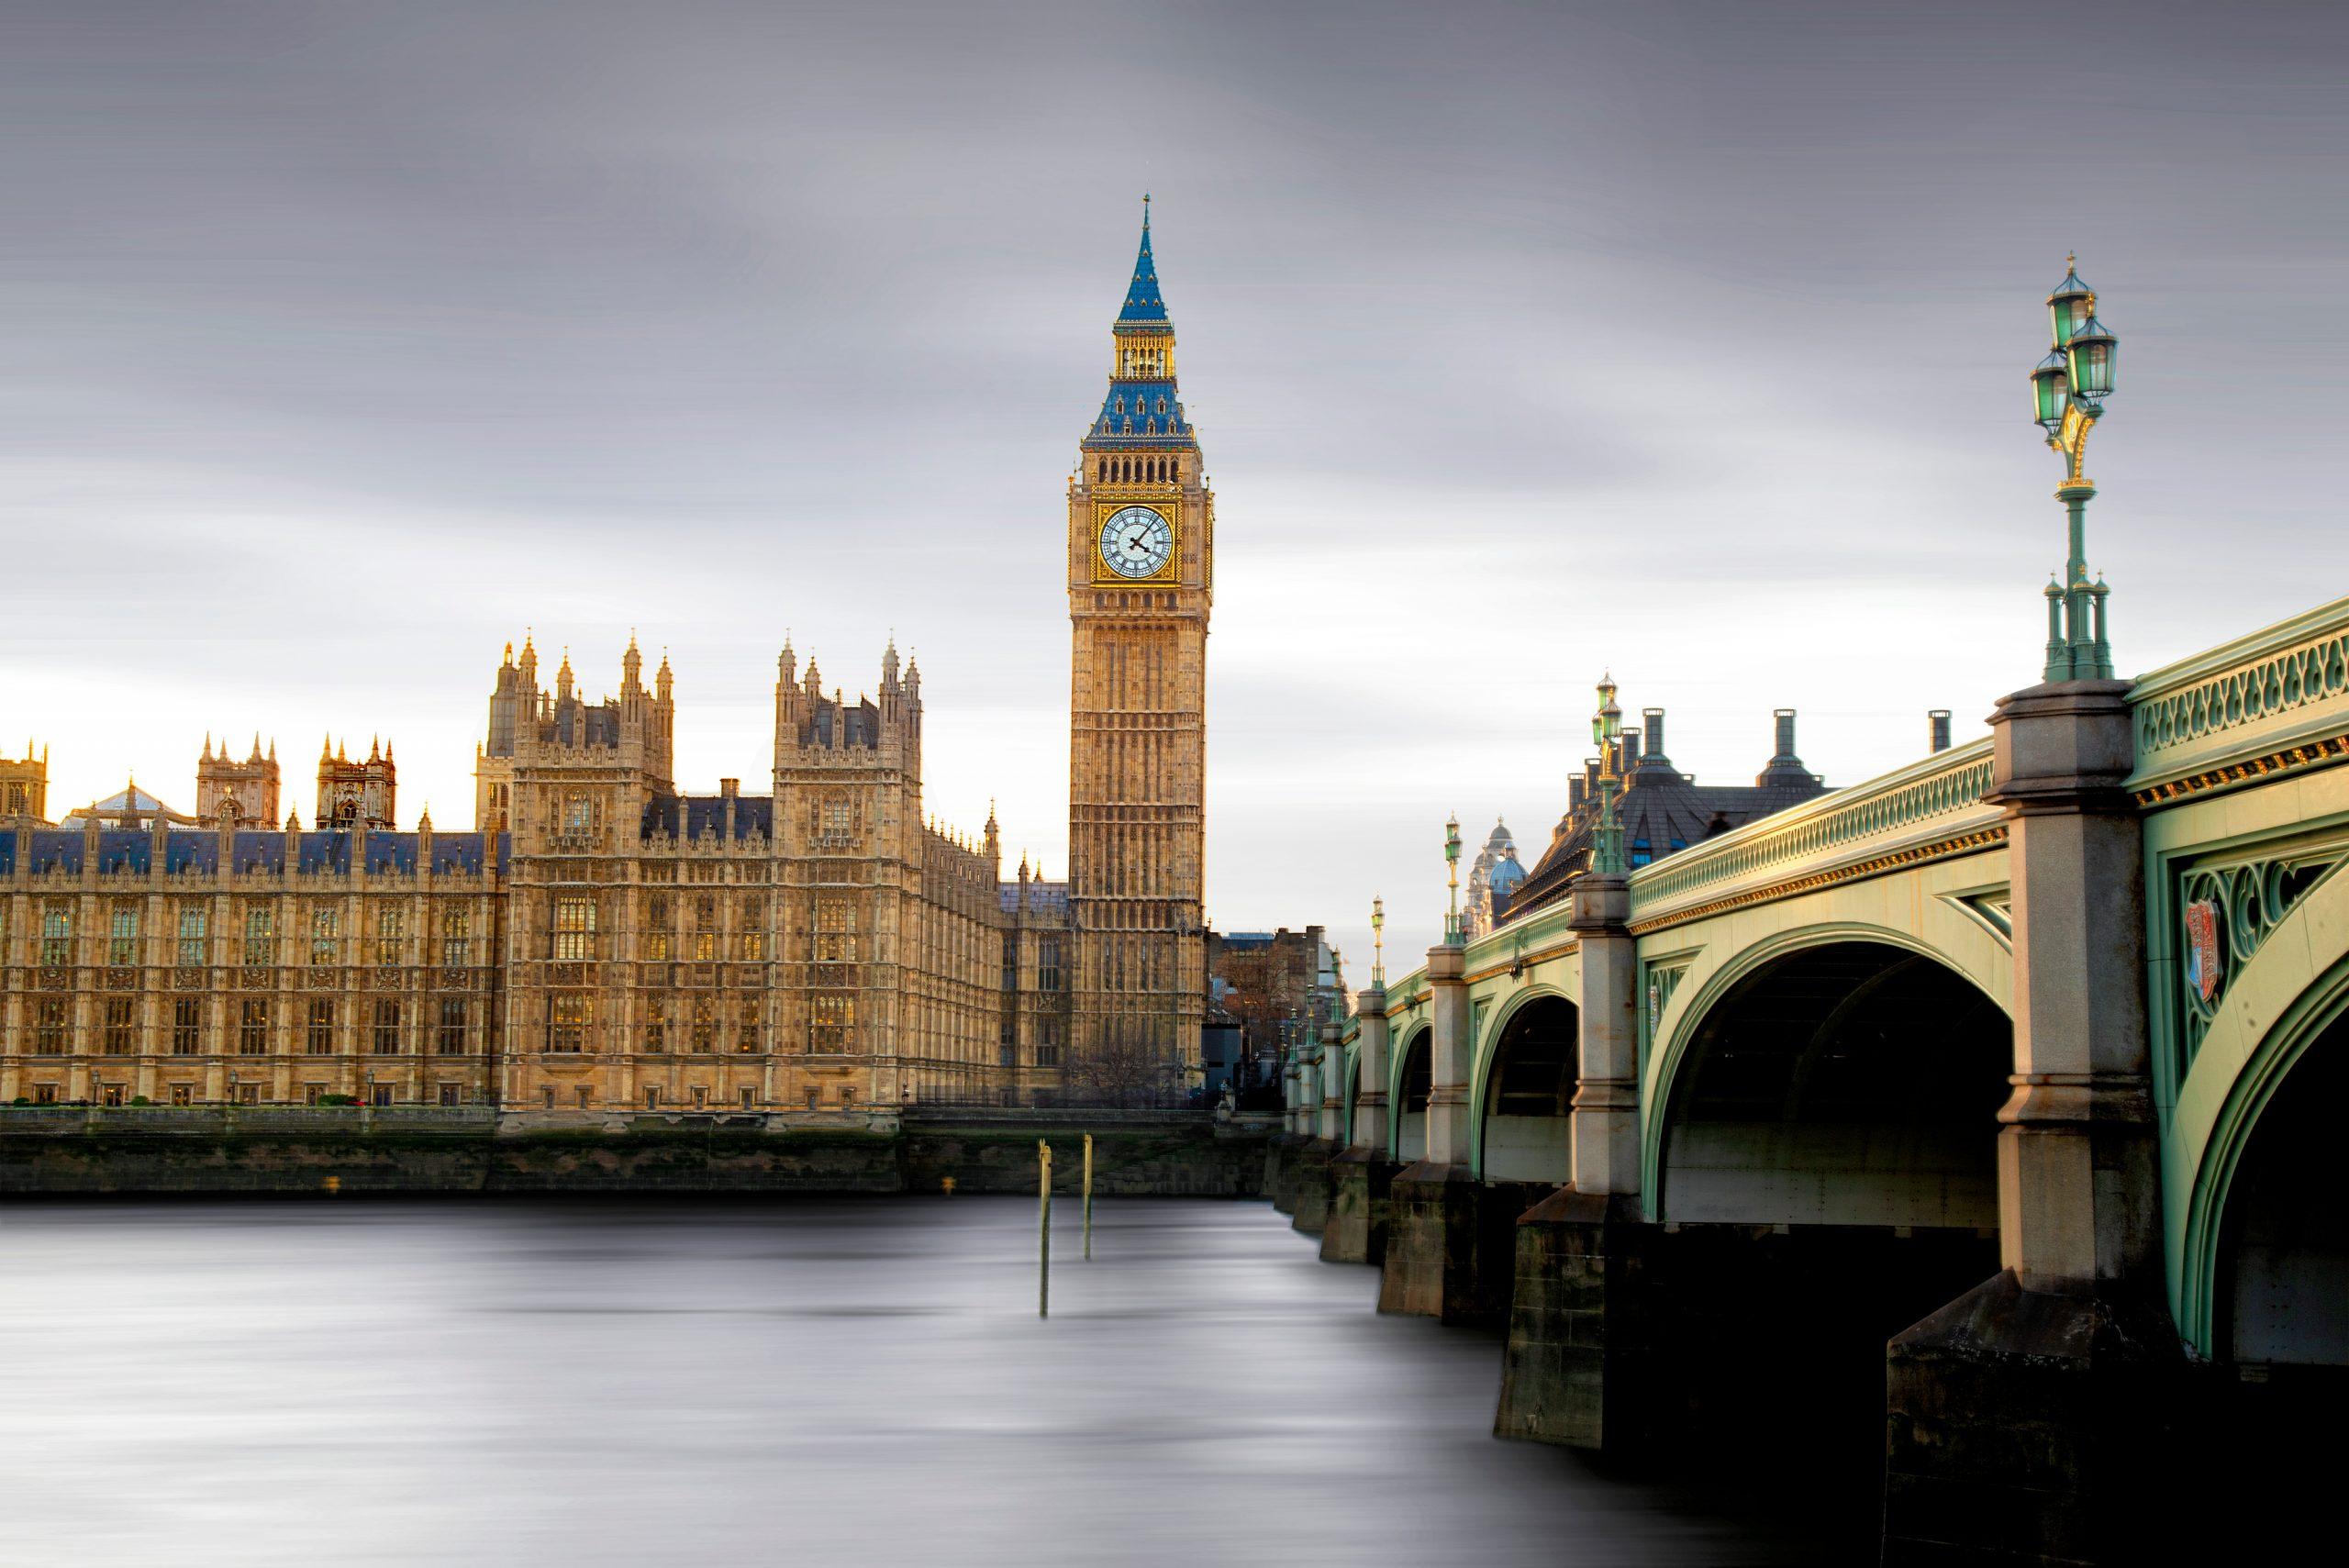 Parliament and Westminster Bridge